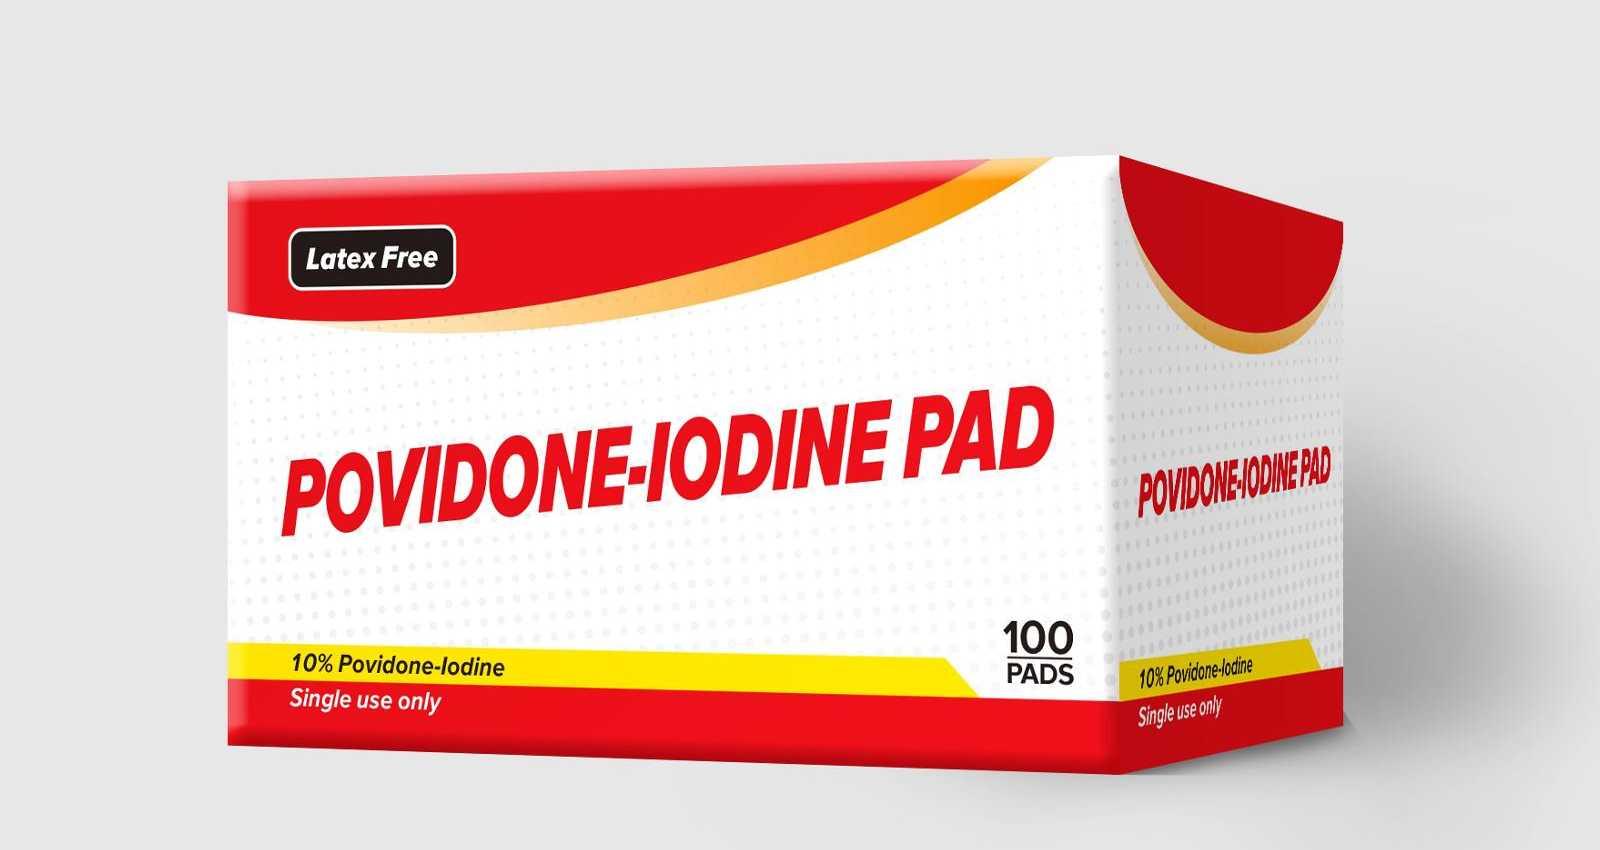 Может ли антисептик с йодом защитить от COVID-19?